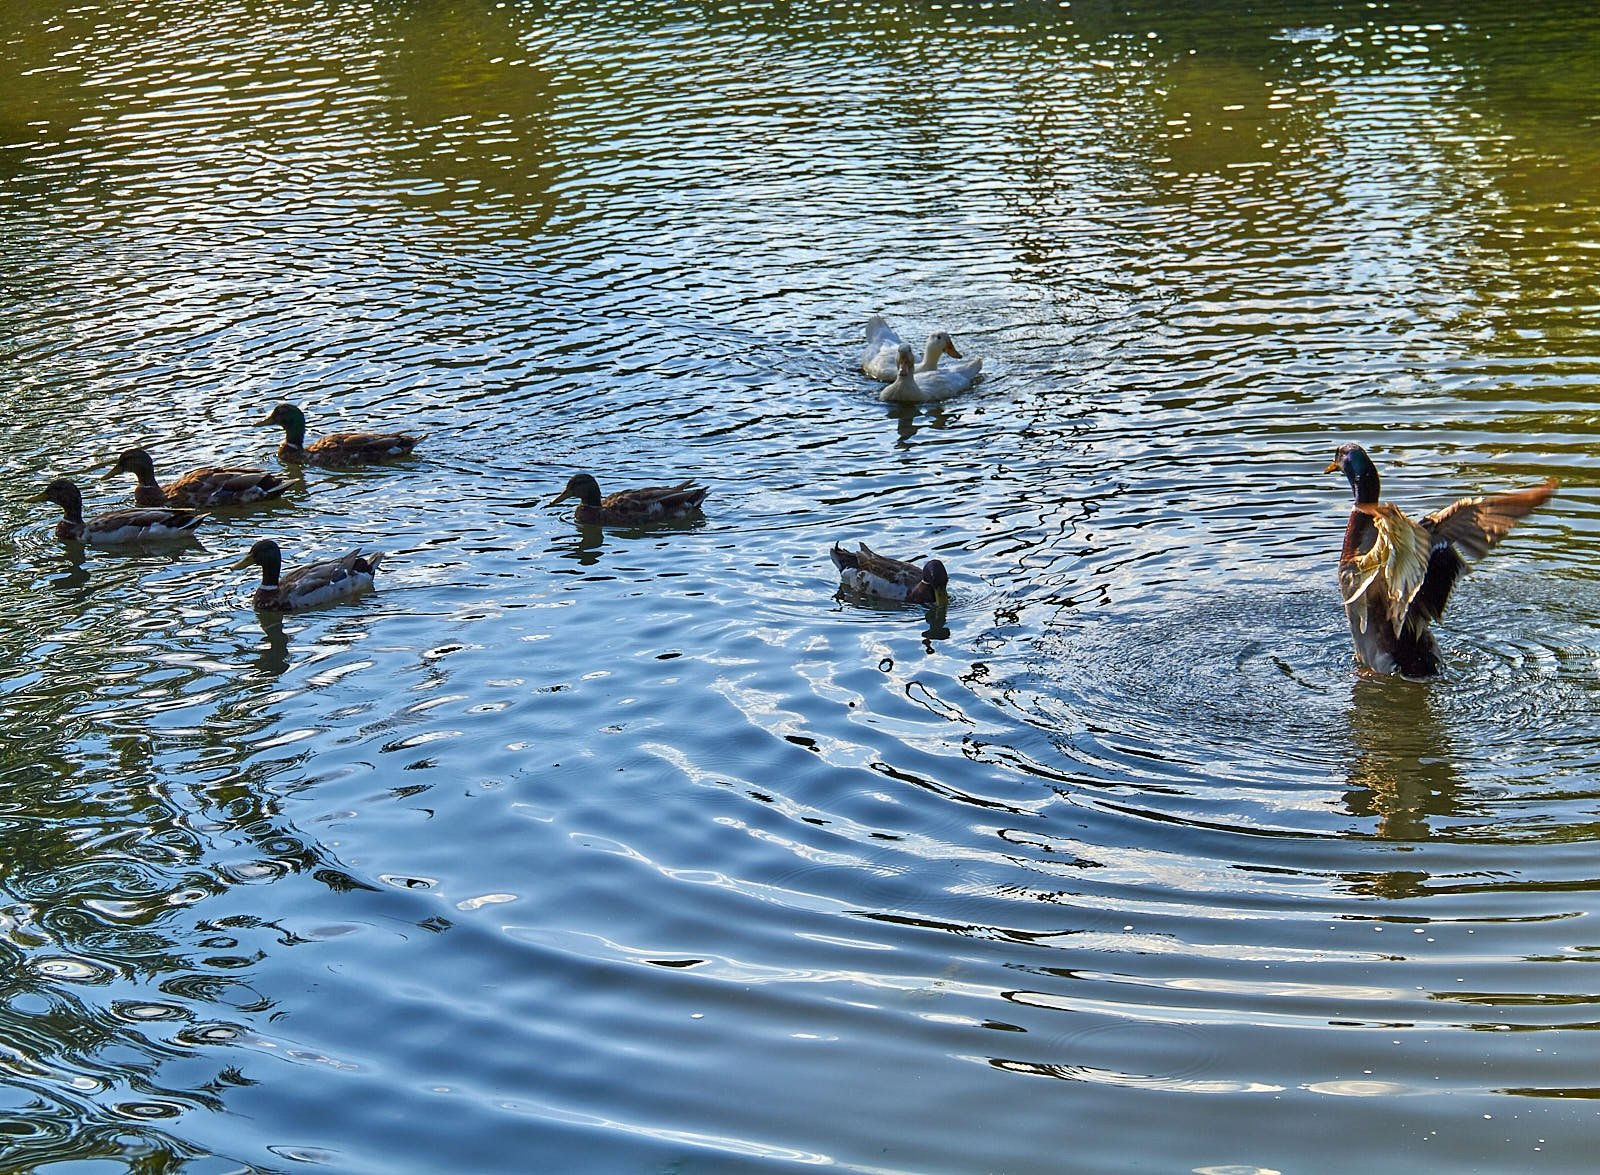 Ducks by Lynette M. Feliciano-Justice